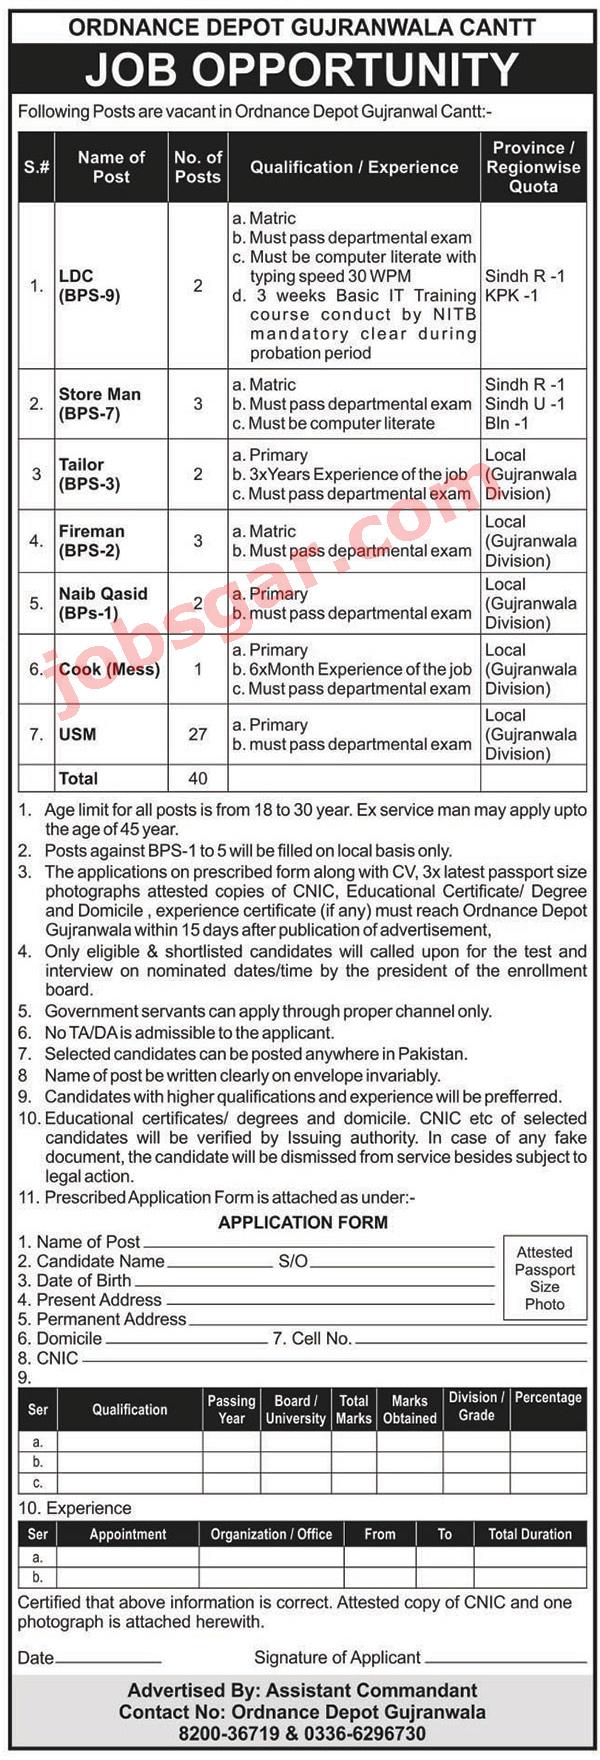 Pakistan Army Ordnance Depot Gujranwala Cantt Jobs 2021